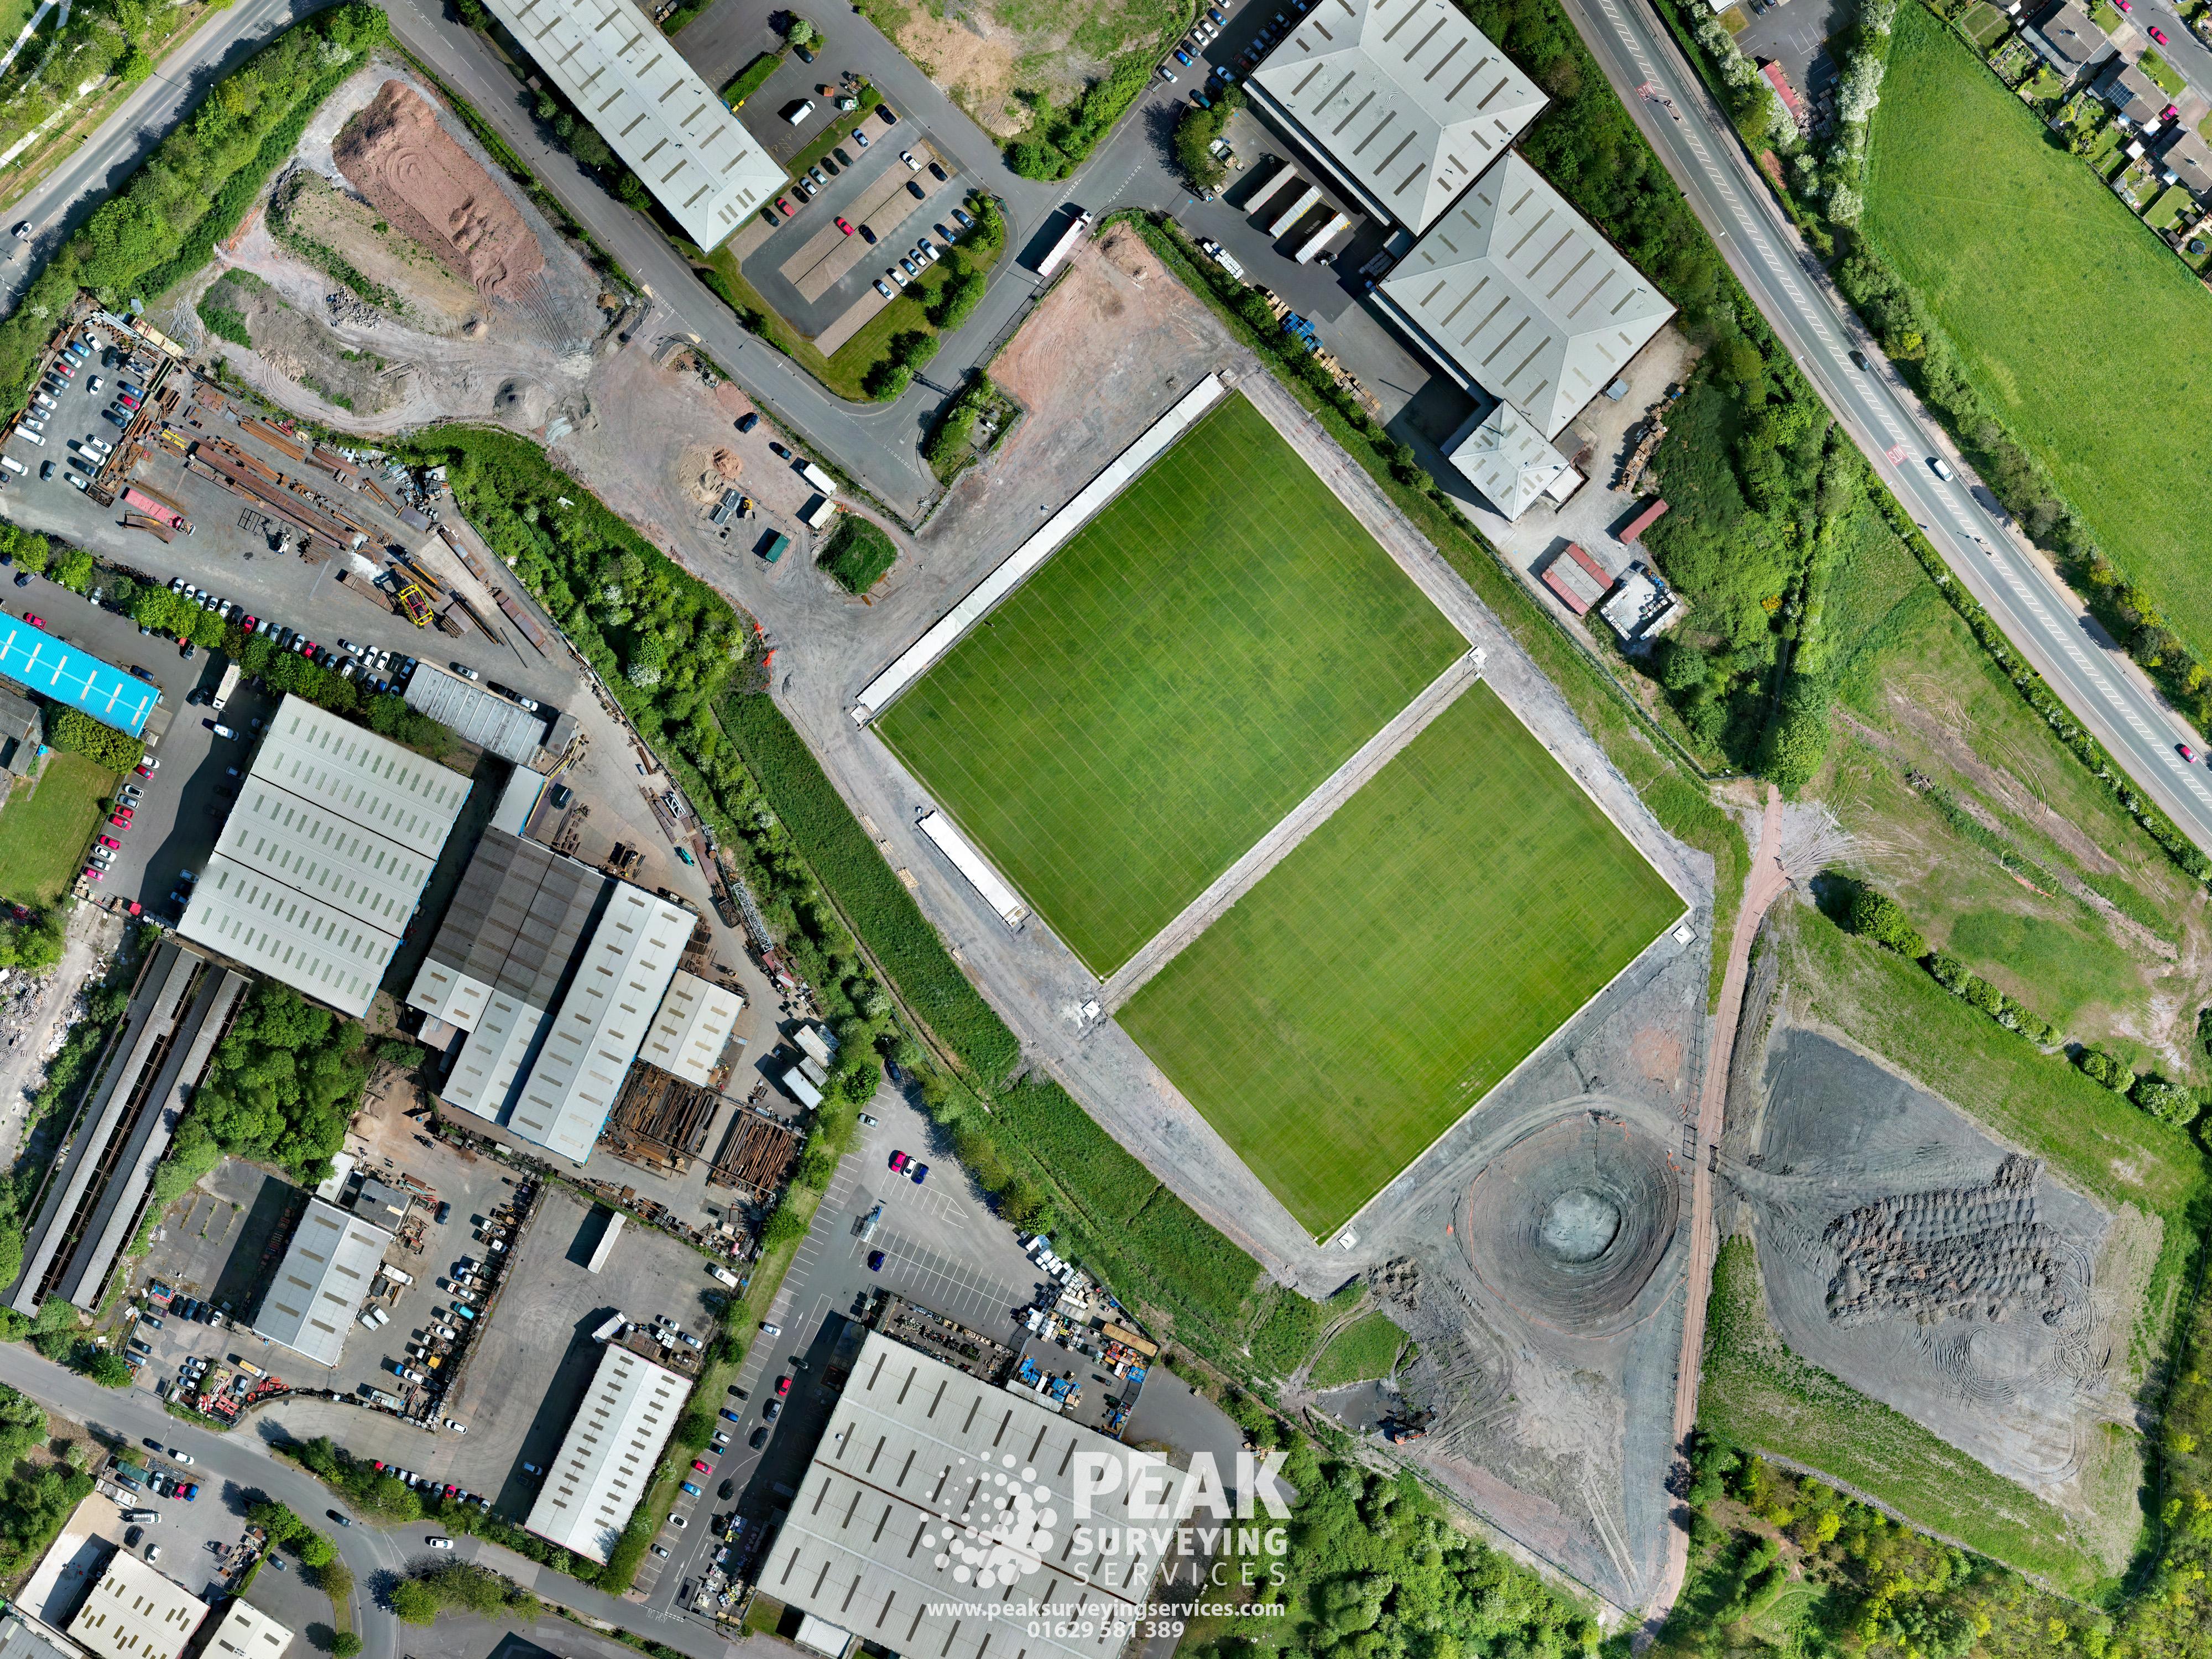 Orthmosaic Aerial Photo